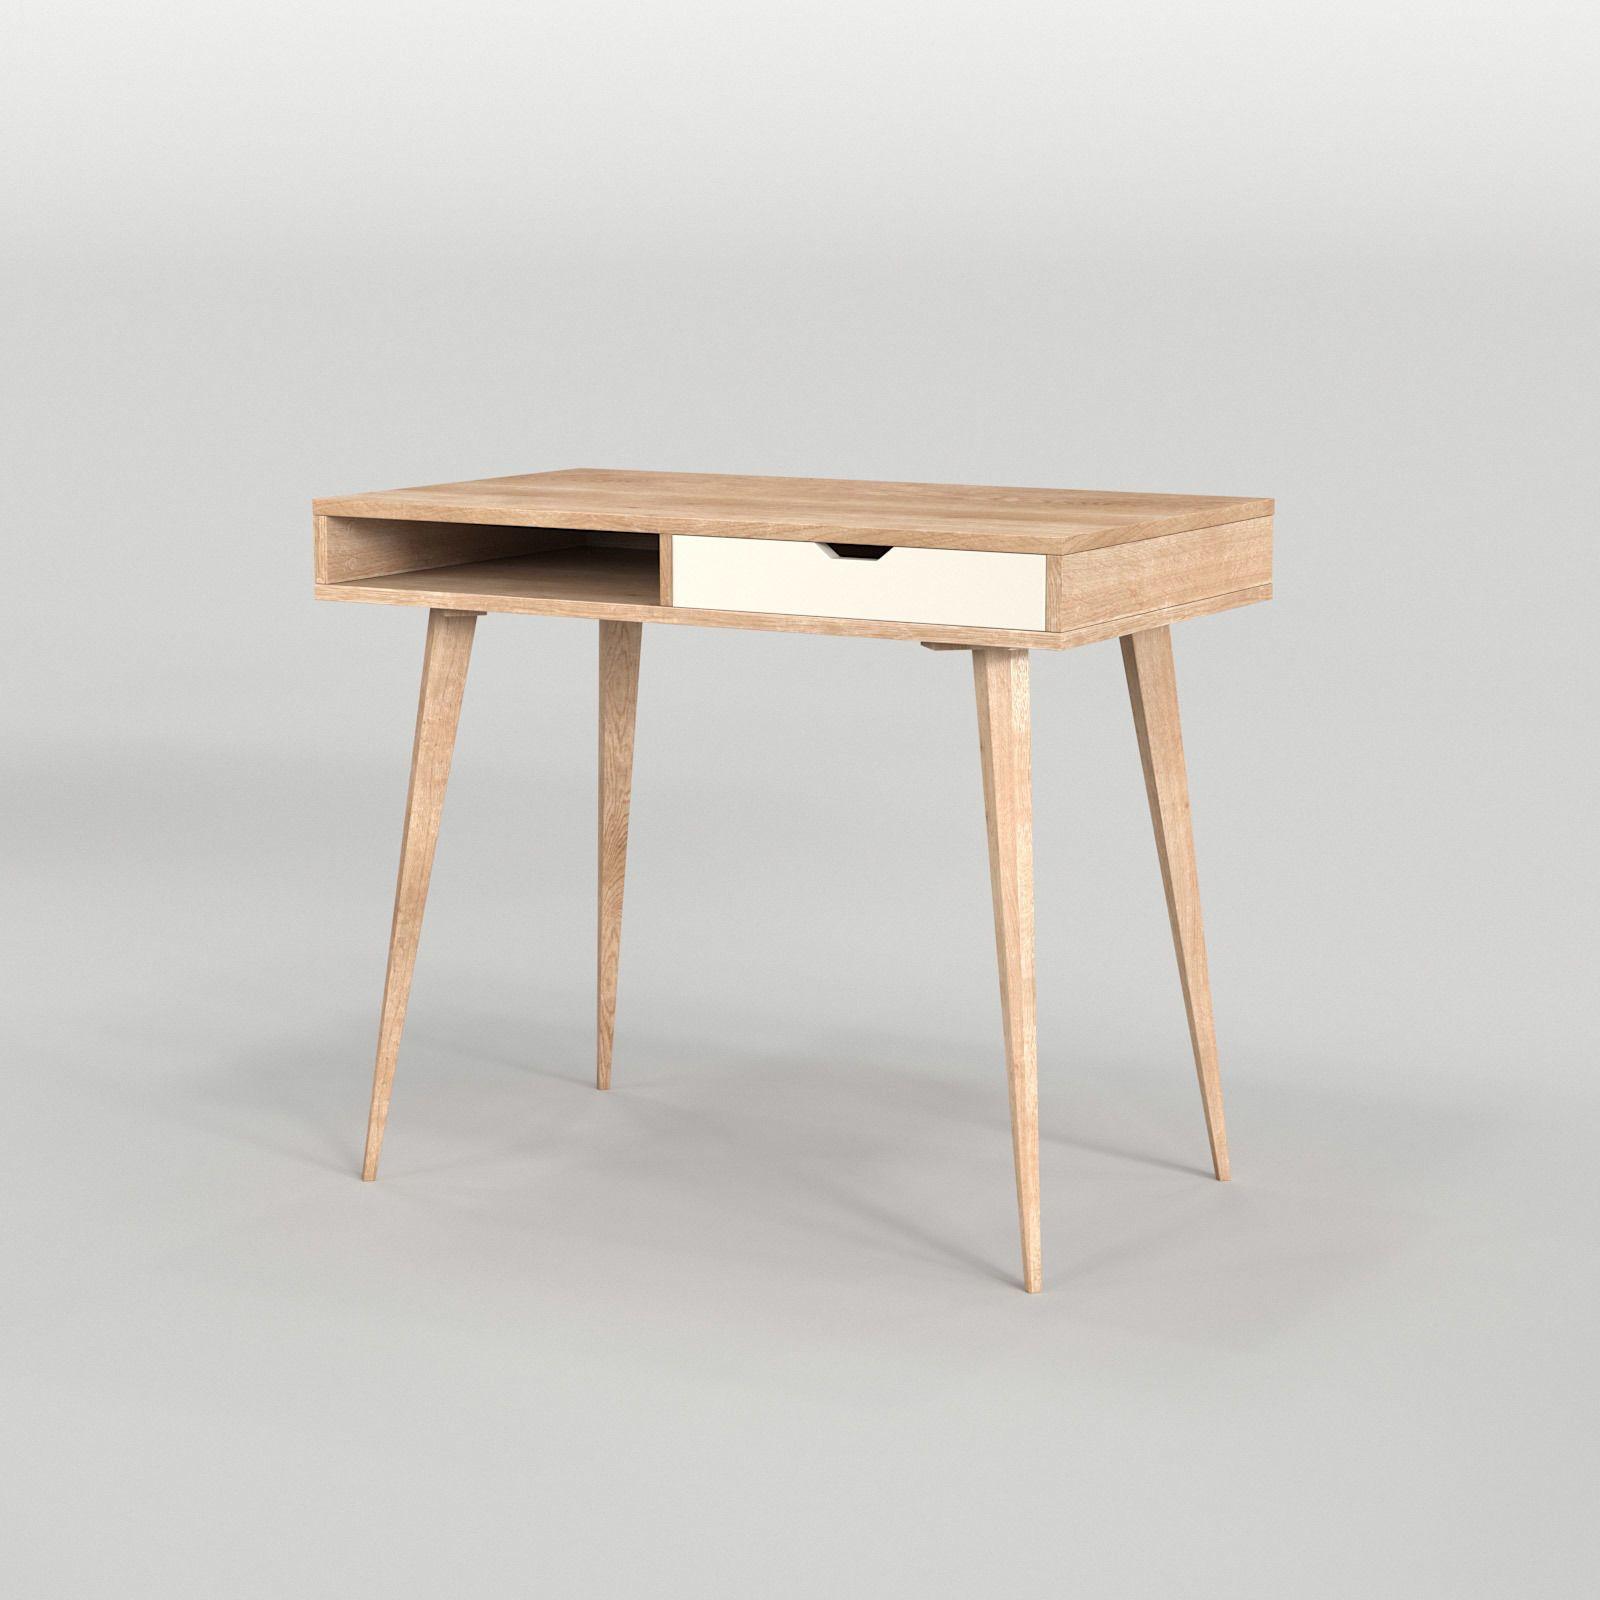 Scandinavian Desk 04 3d Model Scandinavian Desk Scandinavian 3ds Max Models